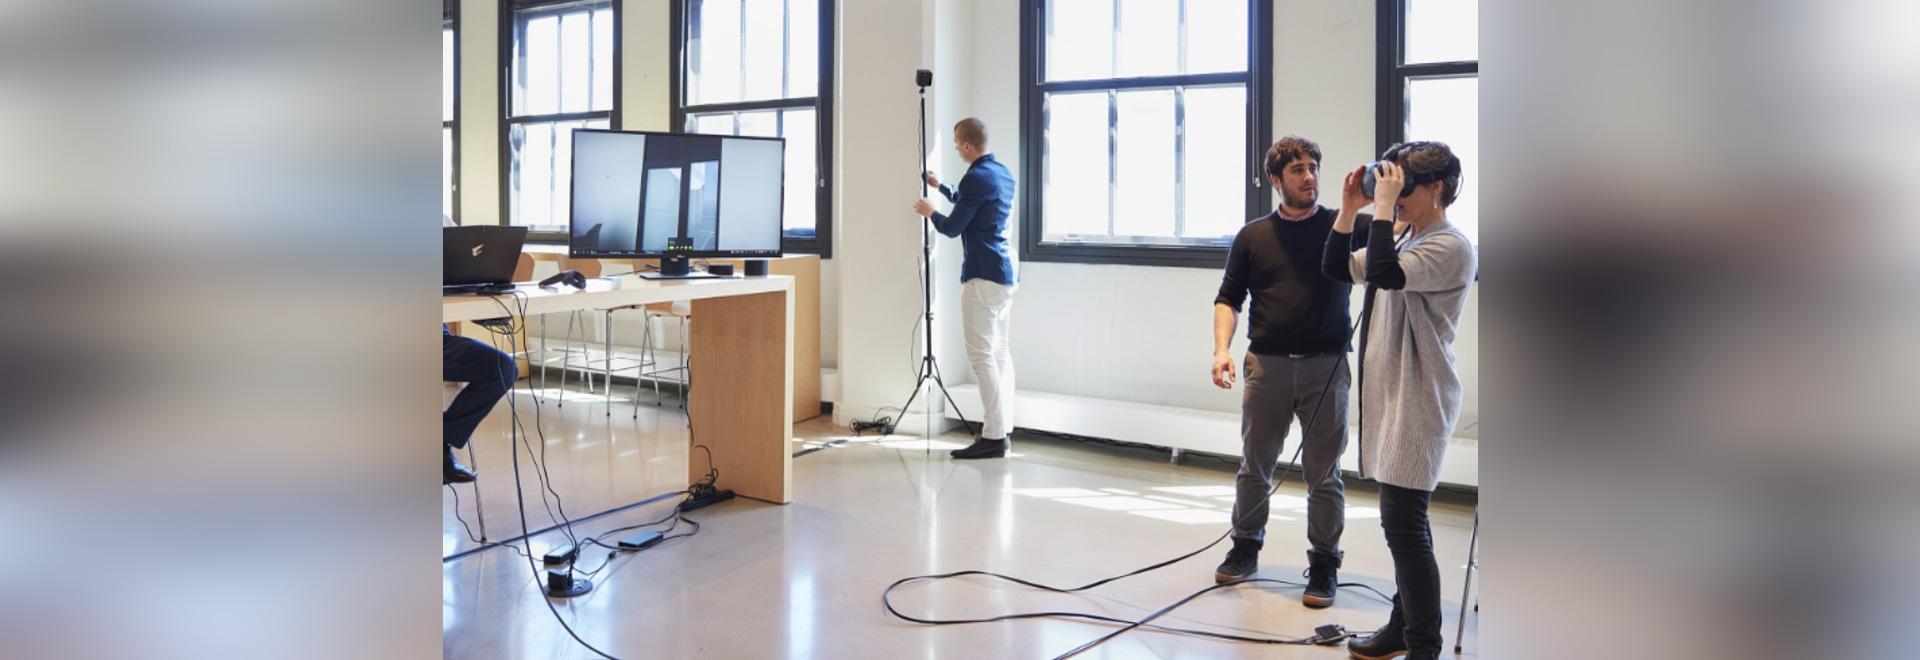 Enhancing Healthcare Planning Through Virtual Reality